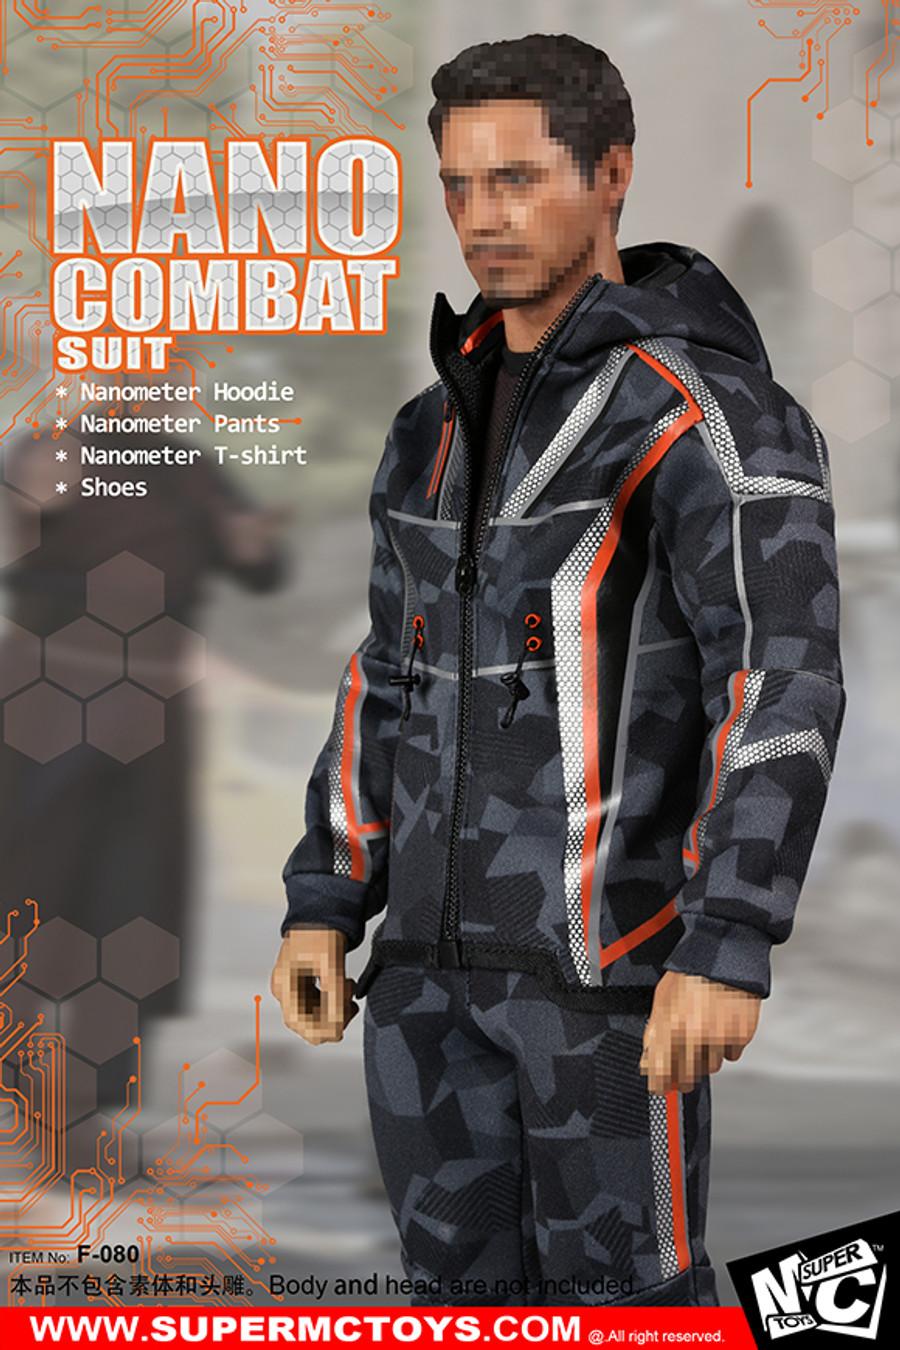 Super MC Toys - Nano Combat Suit